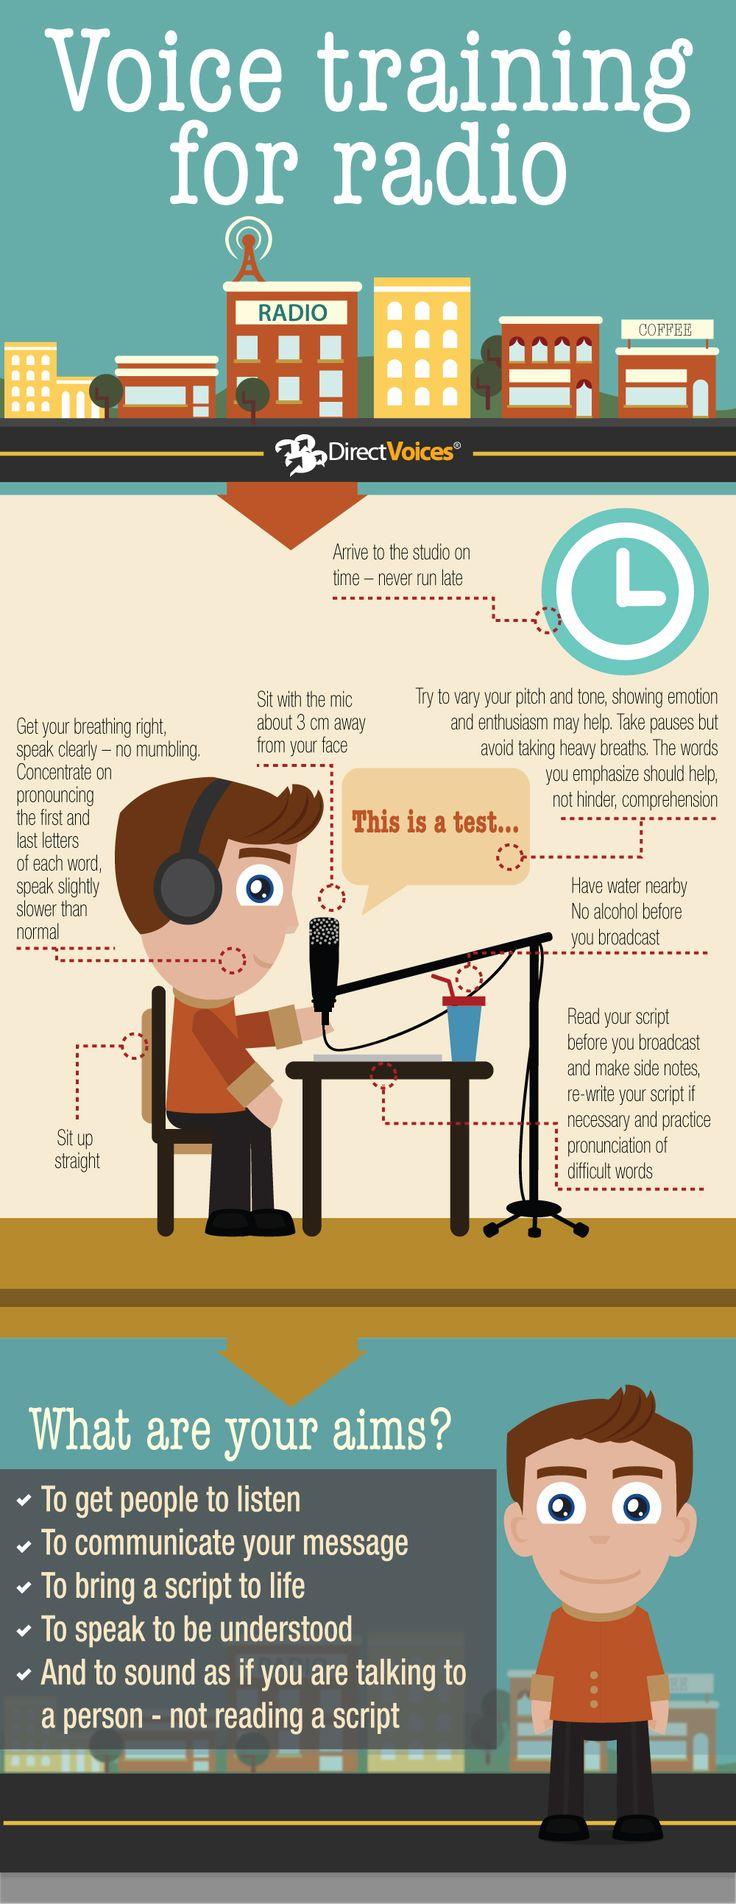 Voice training for radio